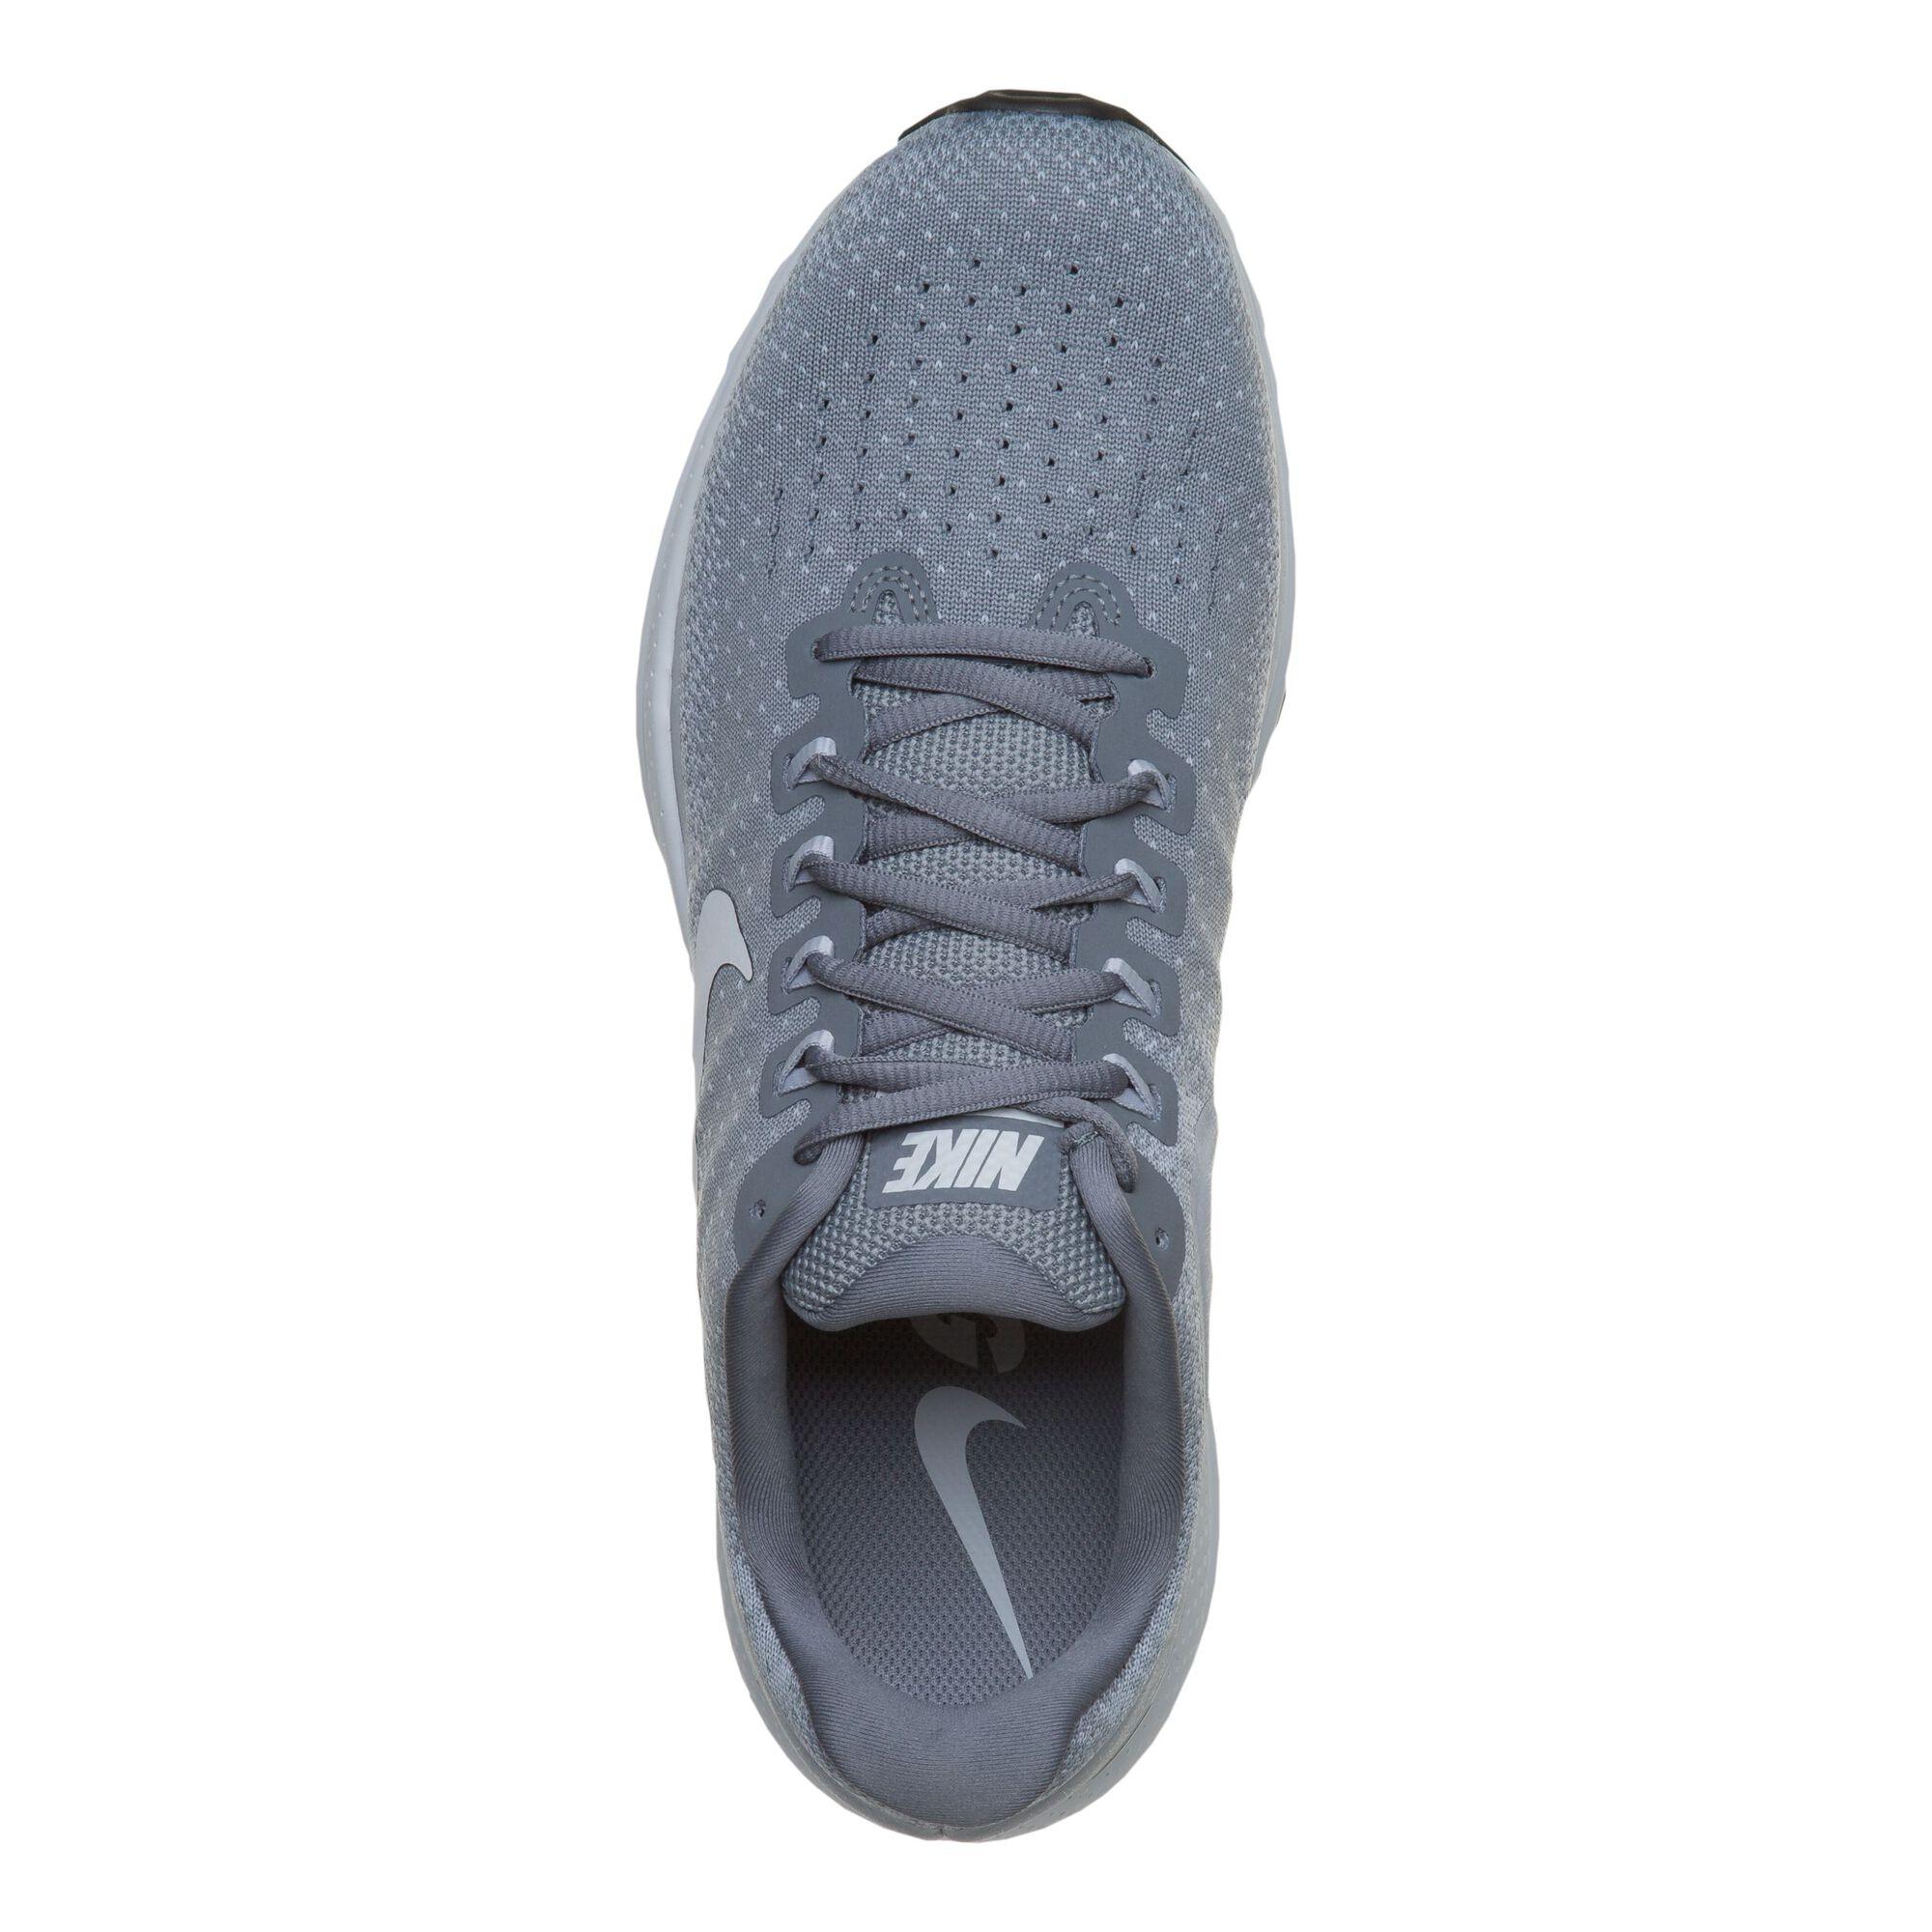 344286d0761b94 buy Nike Air Zoom Vomero 13 Neutral Running Shoe Men - Grey ...